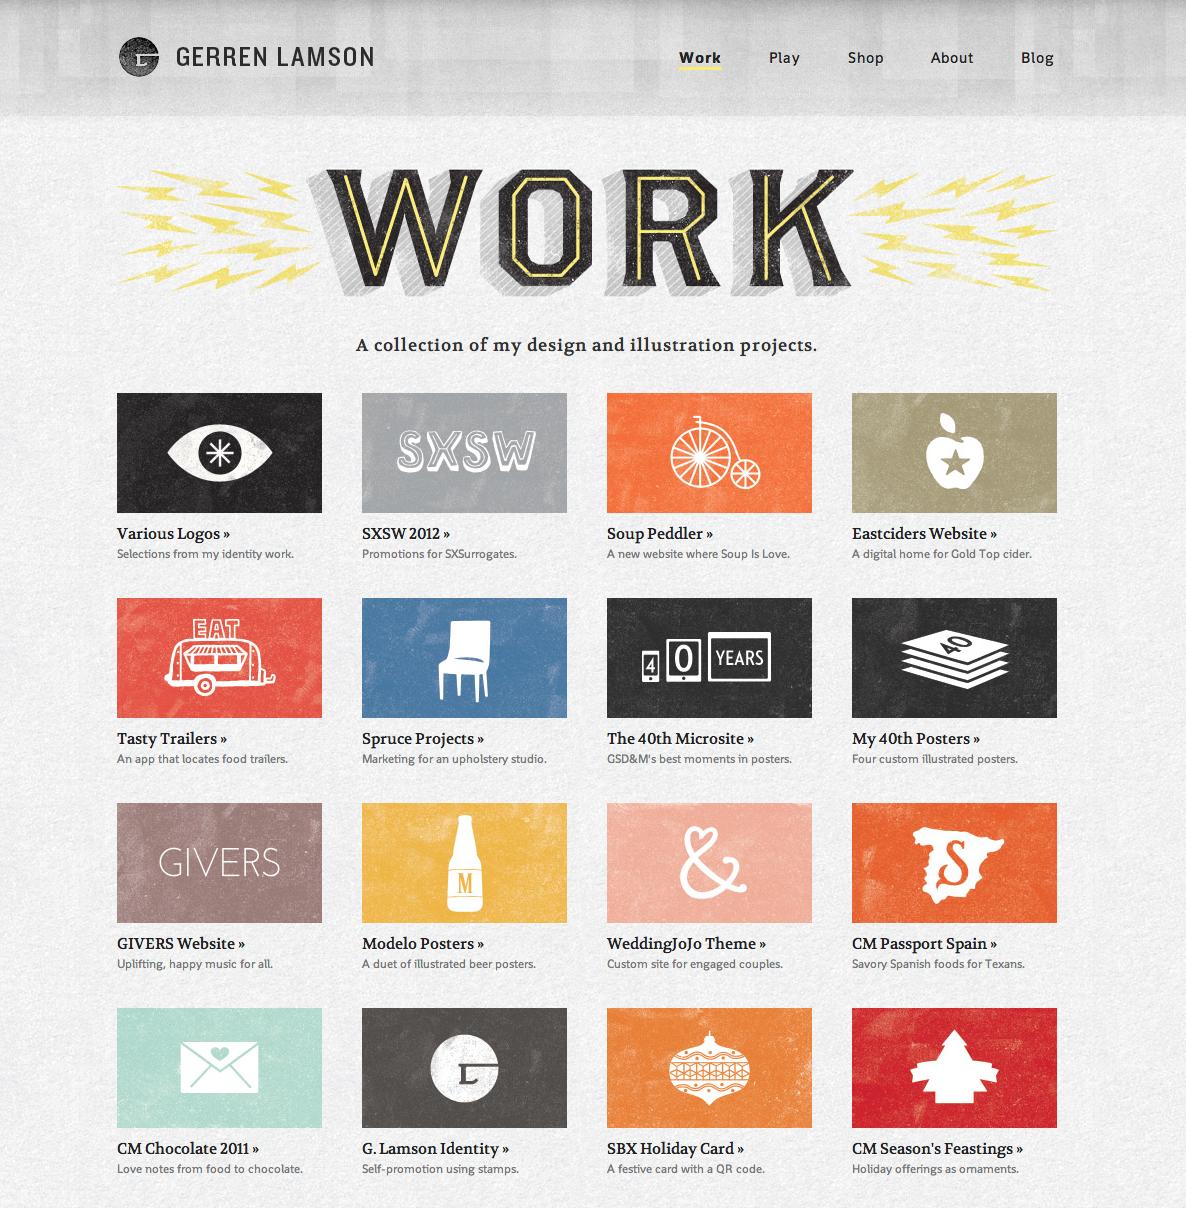 Website Portfolio Grungy Handmade Style Webdesign Portfolio Backgrounds